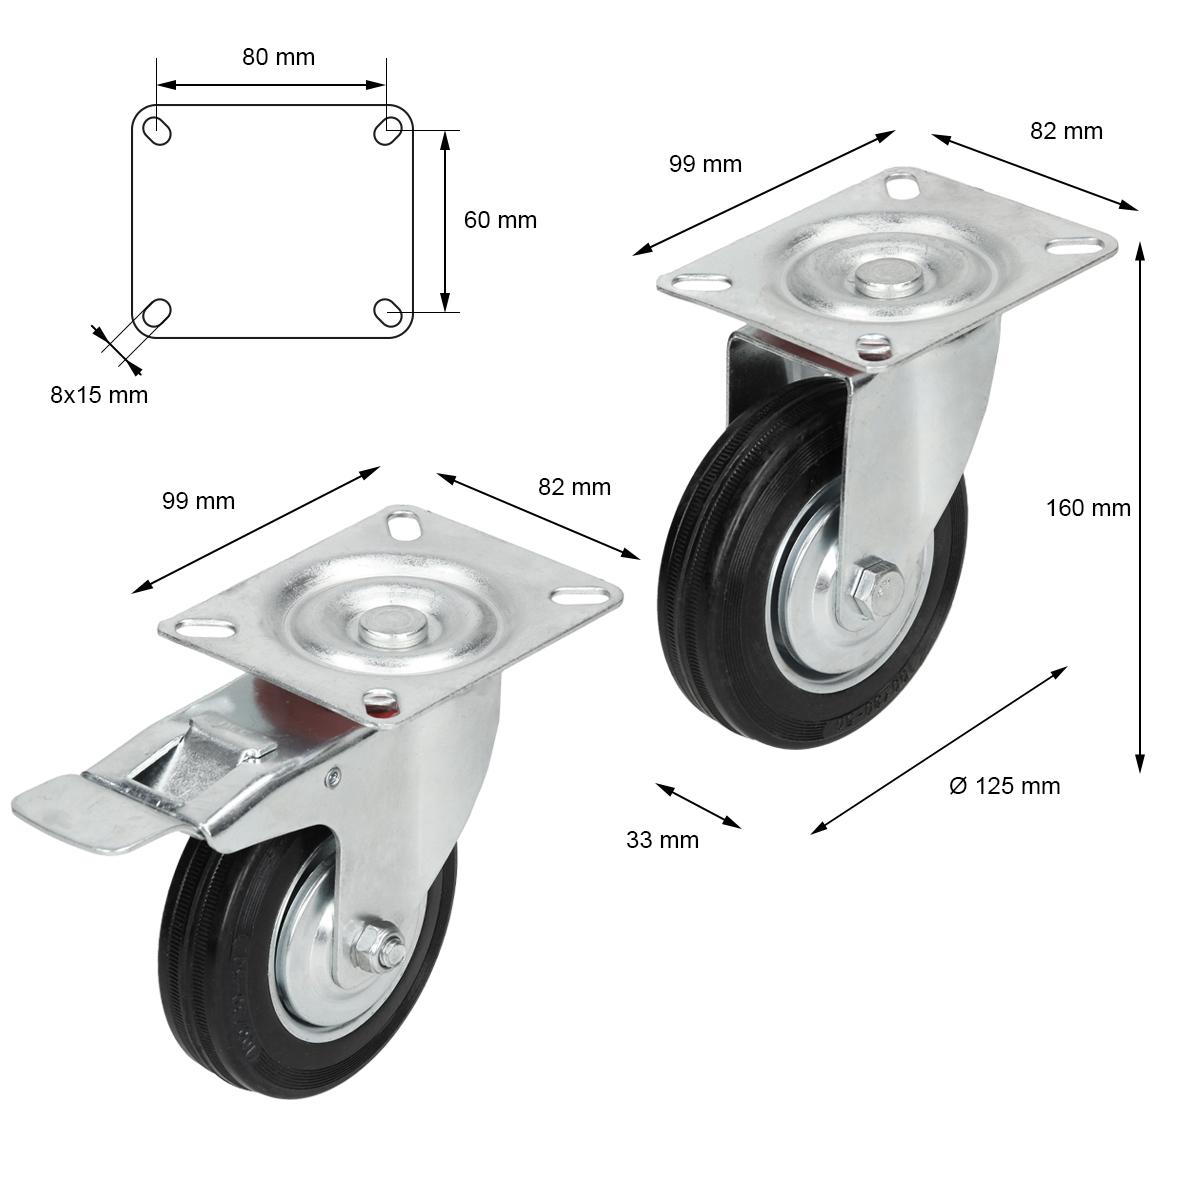 4 x Vollgummi Lenkrolle Transportrolle Schwerlastrolle Rolle Ø 125 mm Bock-Brems